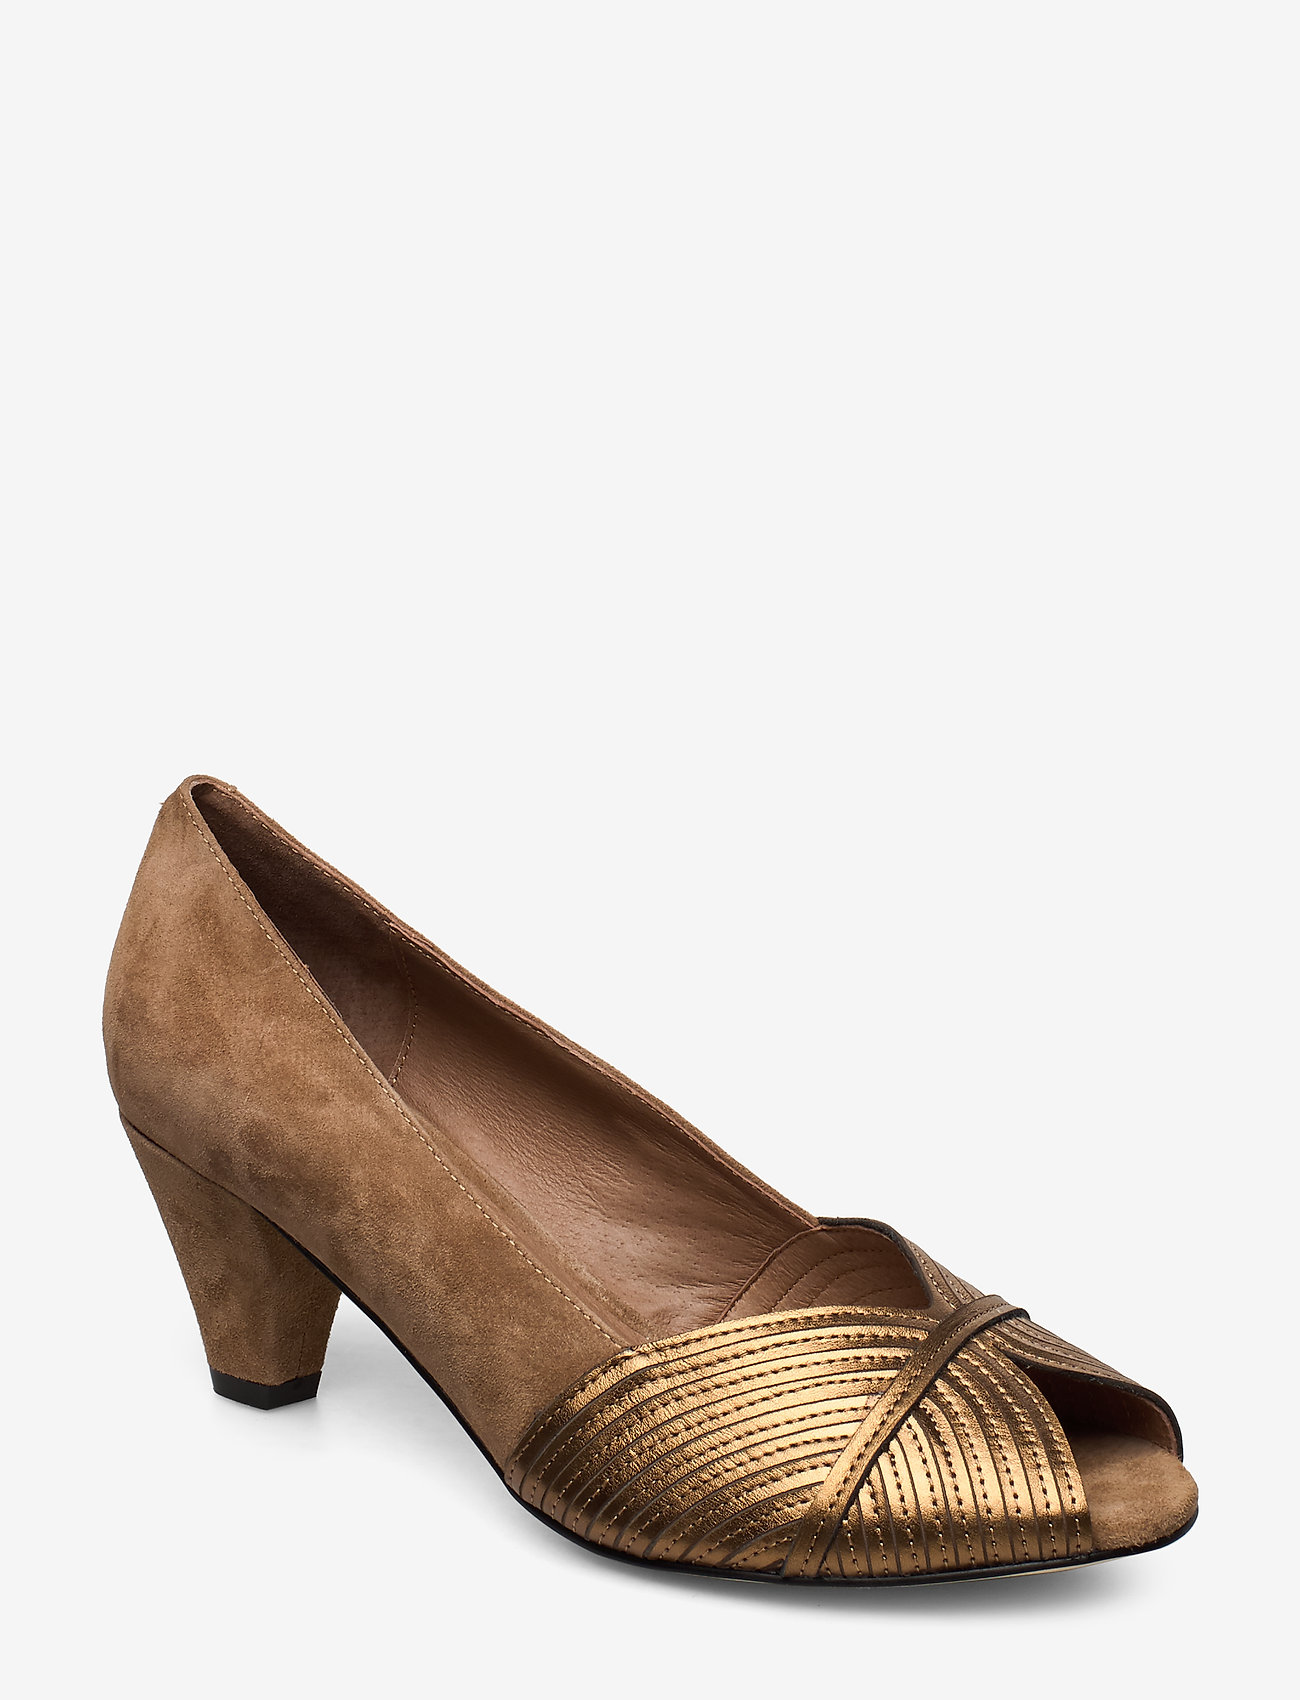 Sofie Schnoor - Shoe - peeptoes - toffee - 0